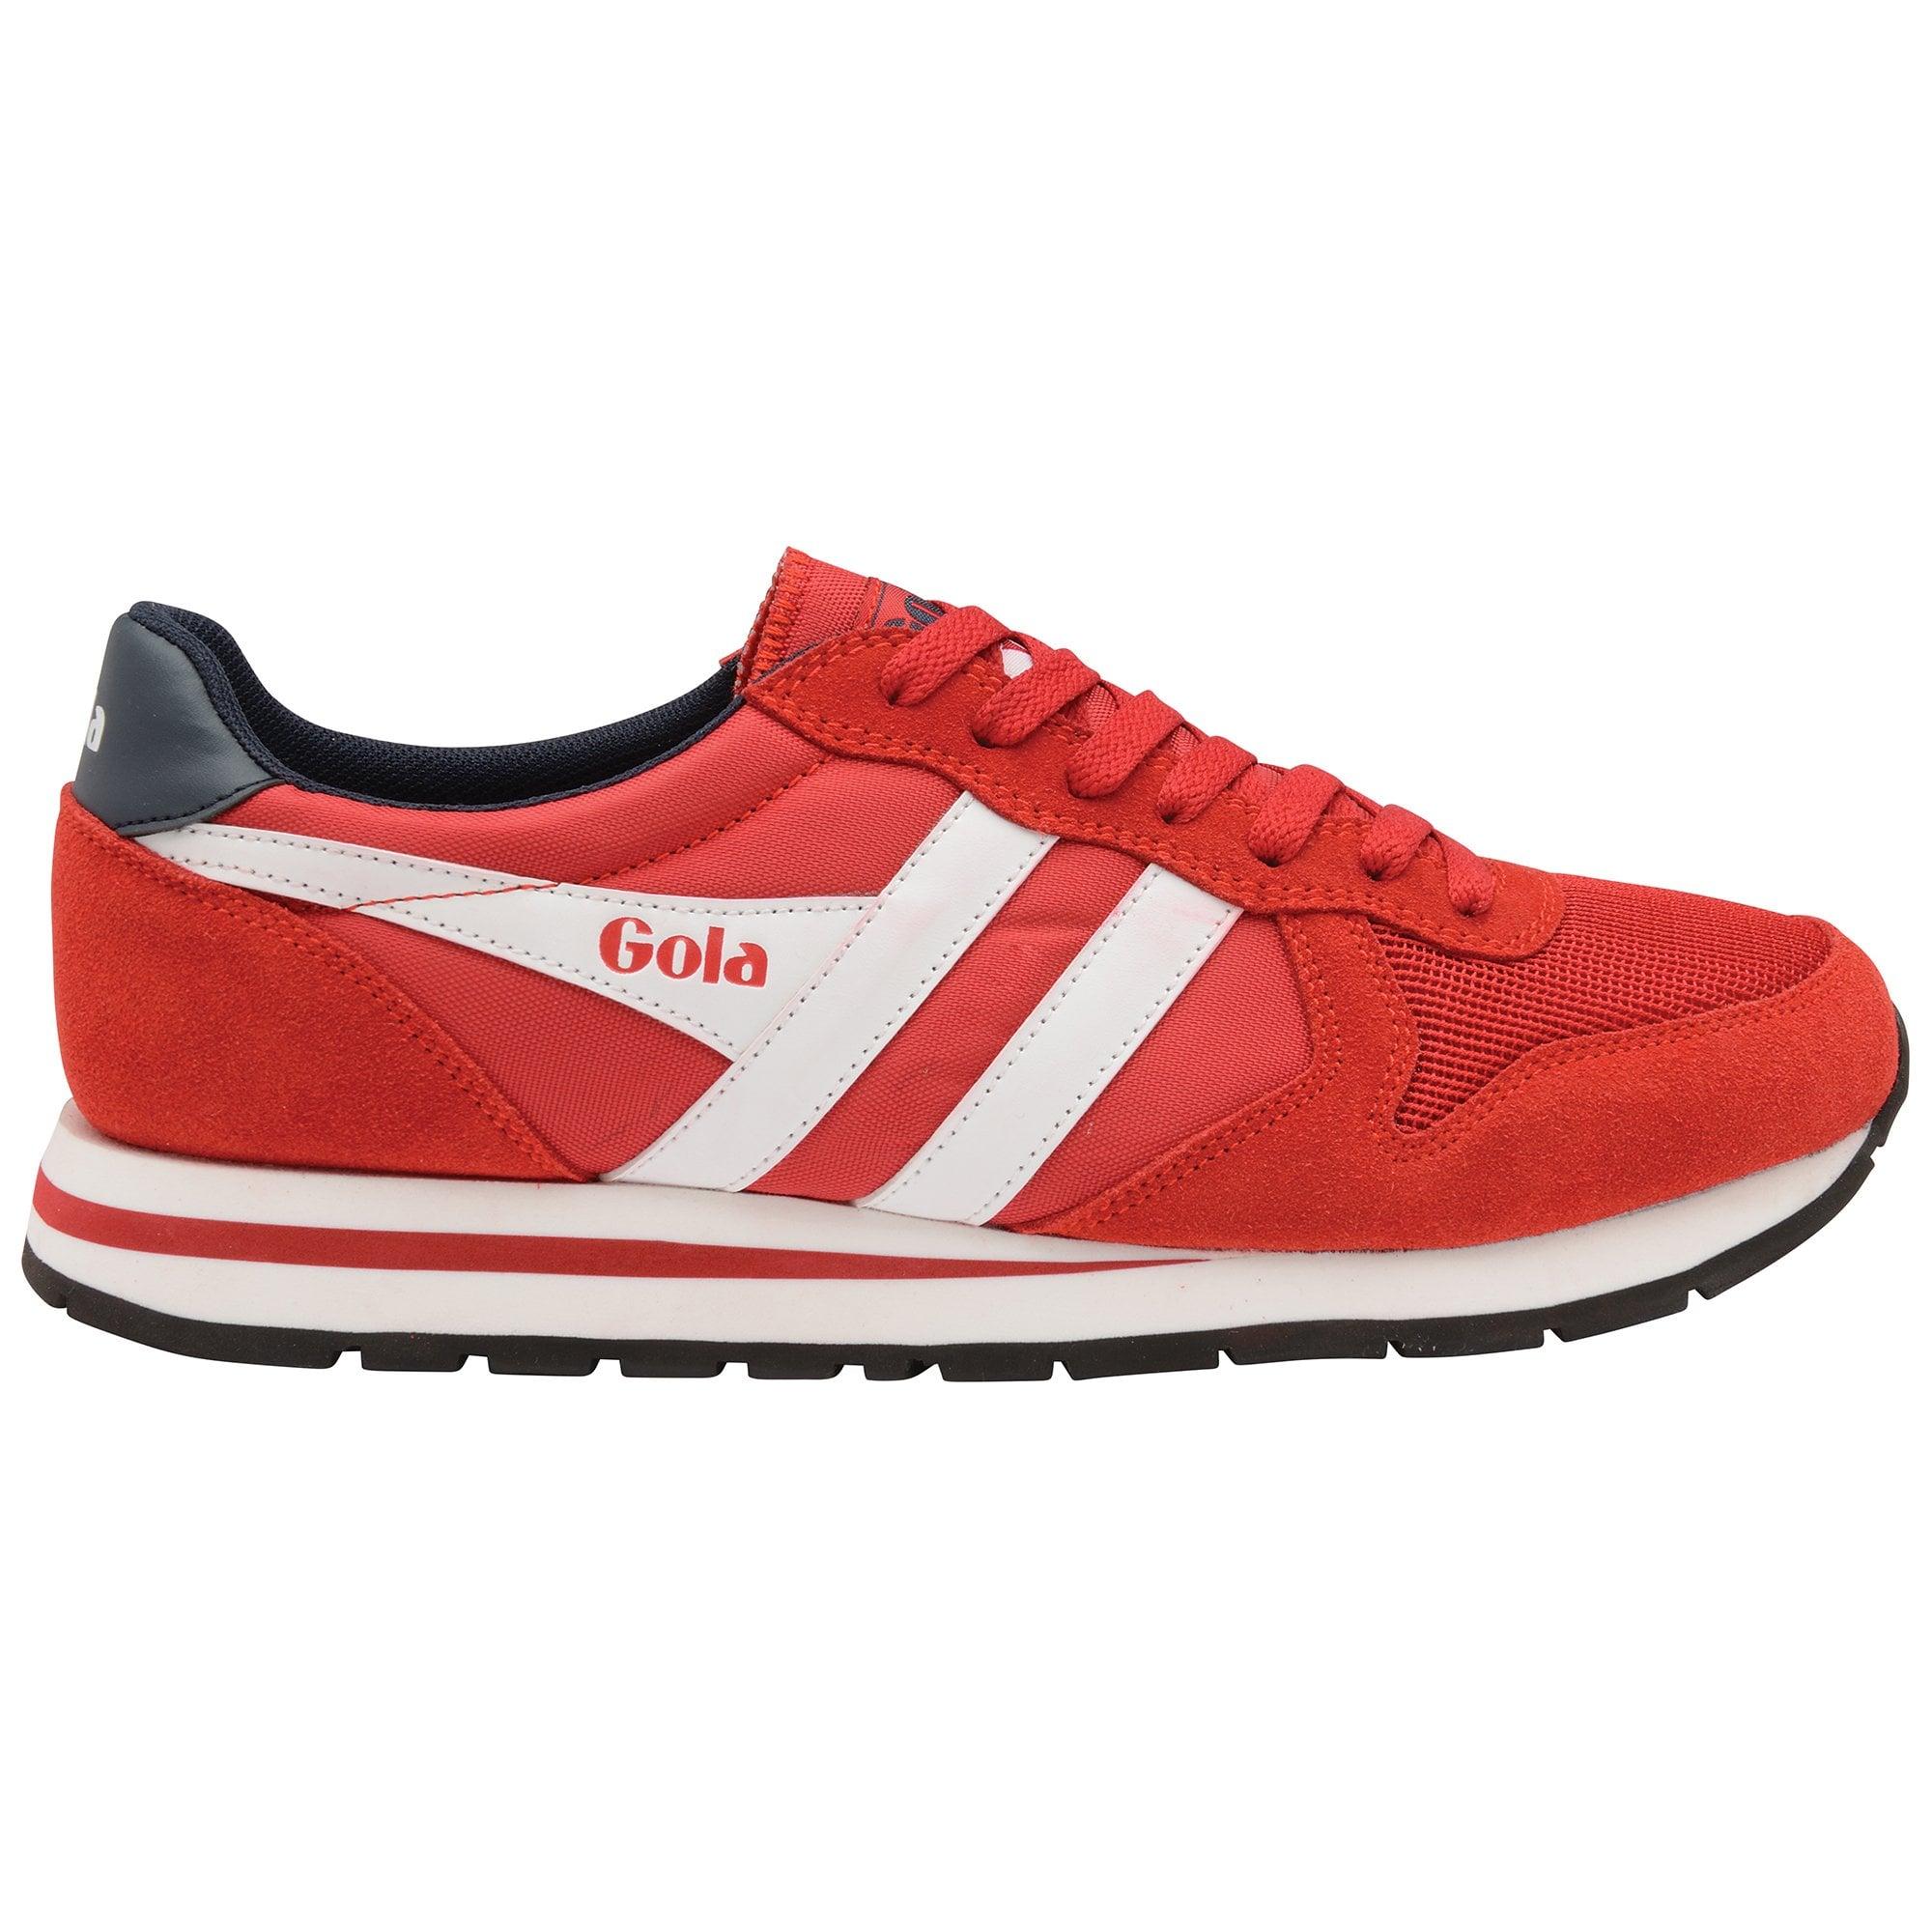 Buy Gola Mens Daytona trainers in red